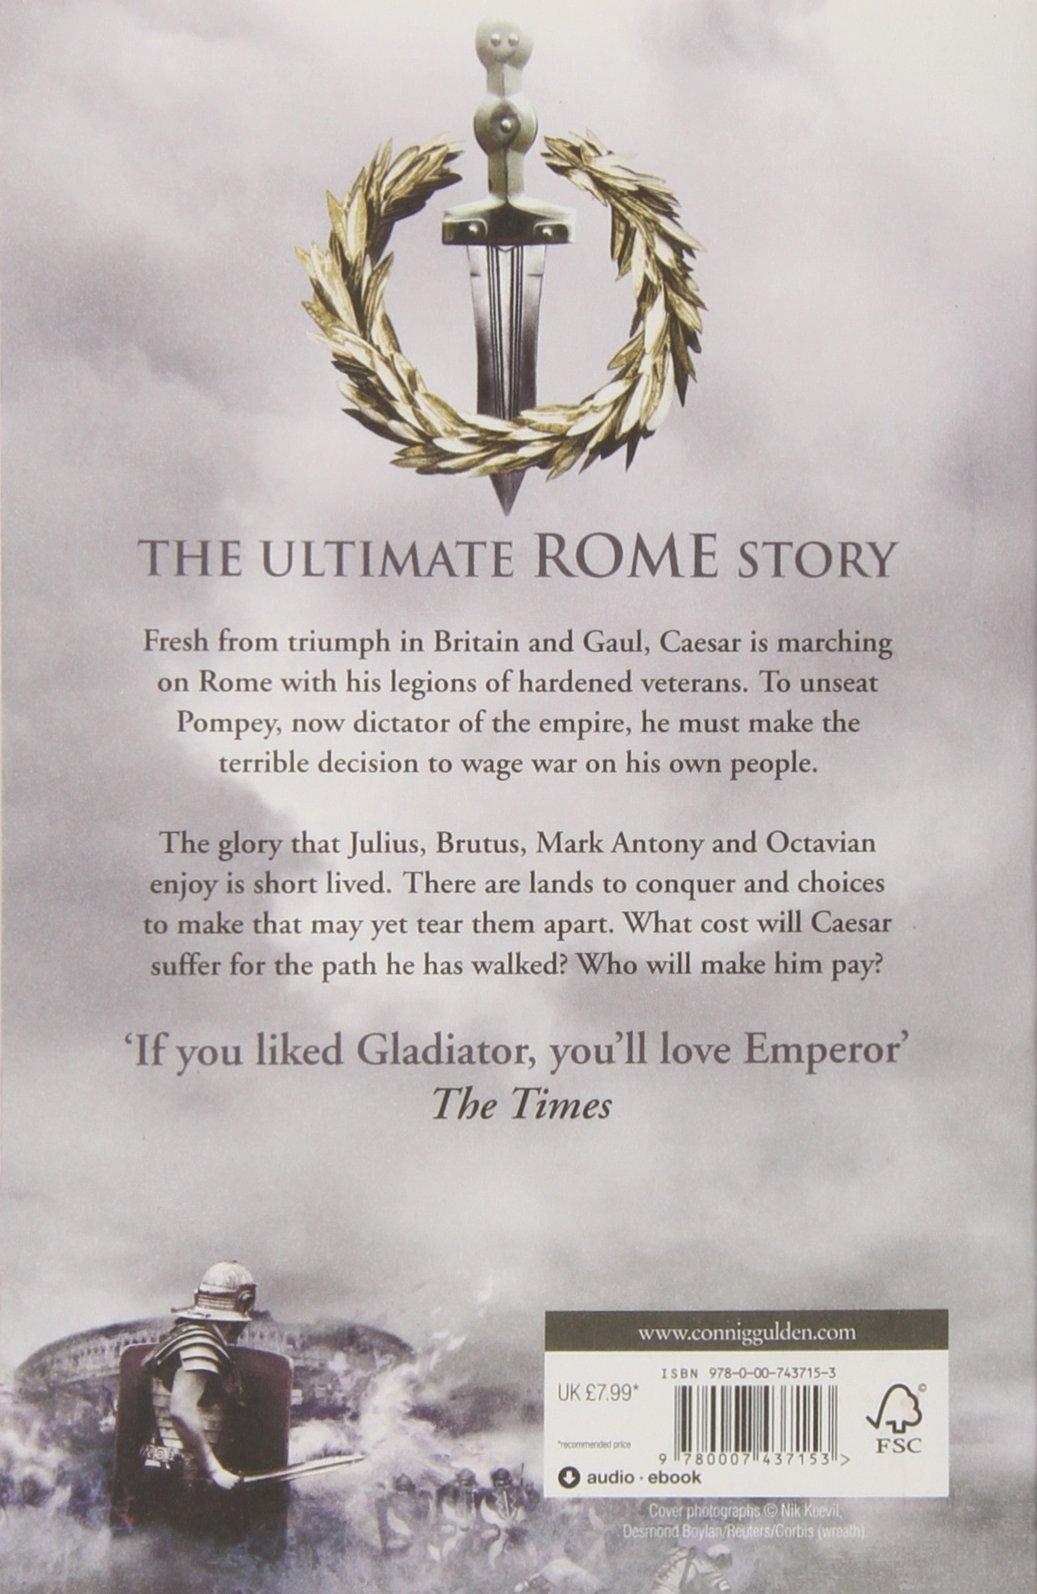 The Gods Of War (emperor Series, Book 4): Amazon: Conn Iggulden:  8601300030289: Books